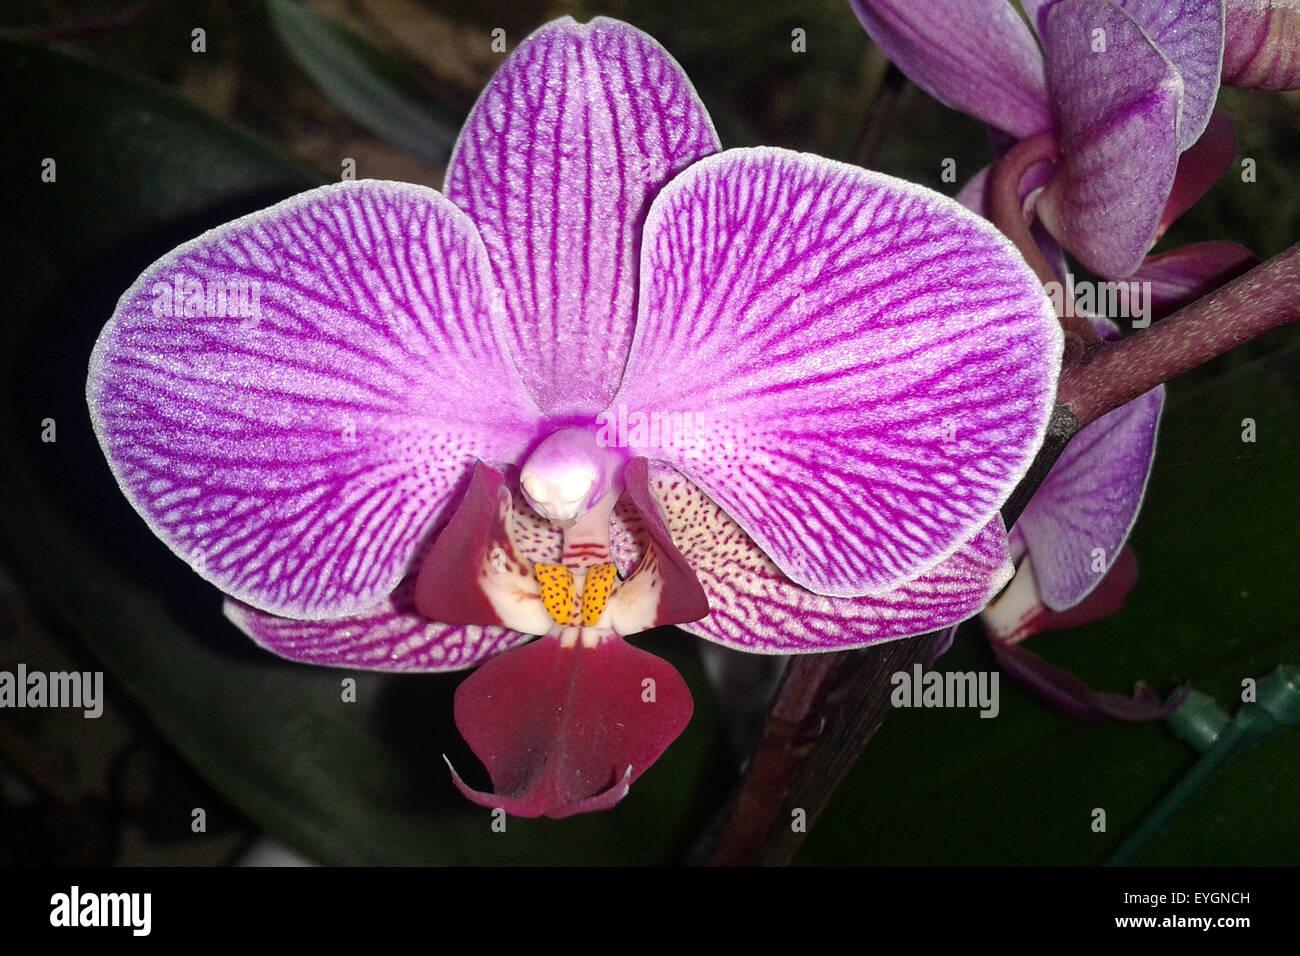 Phalaenopsis, Orchidee - Stock Image